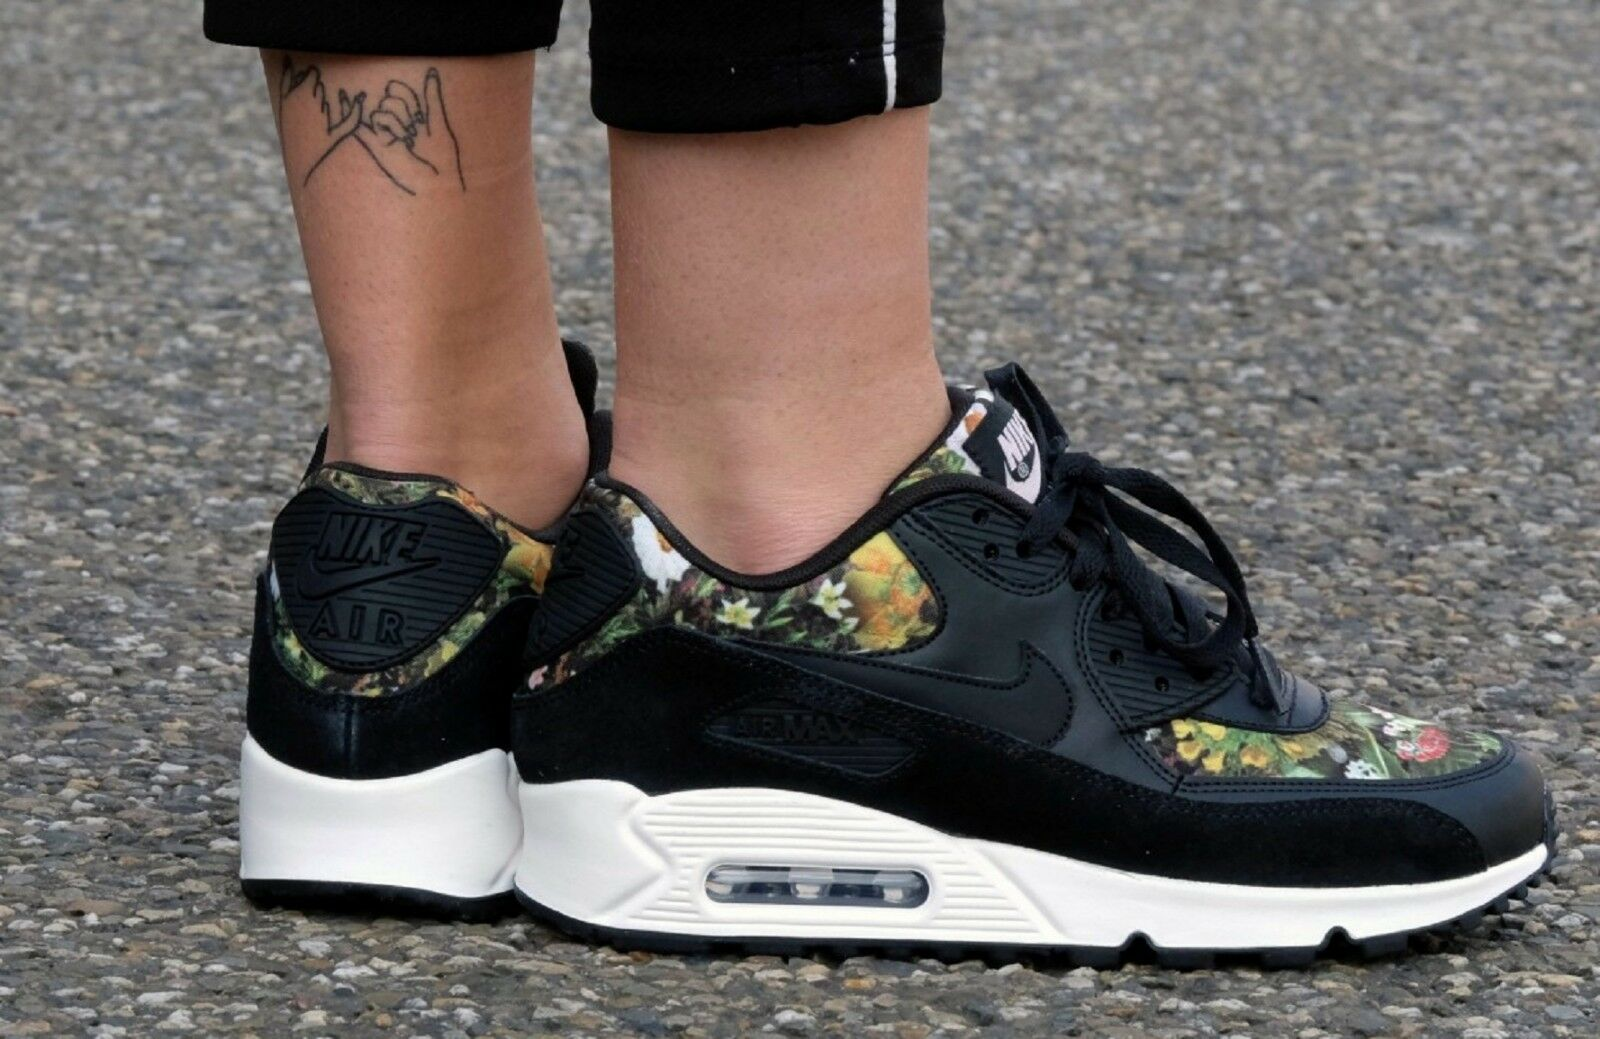 sweden nike air max 90 zapatos para mujer de comodidad de de estilo de vida  estampado cd96b745e175e